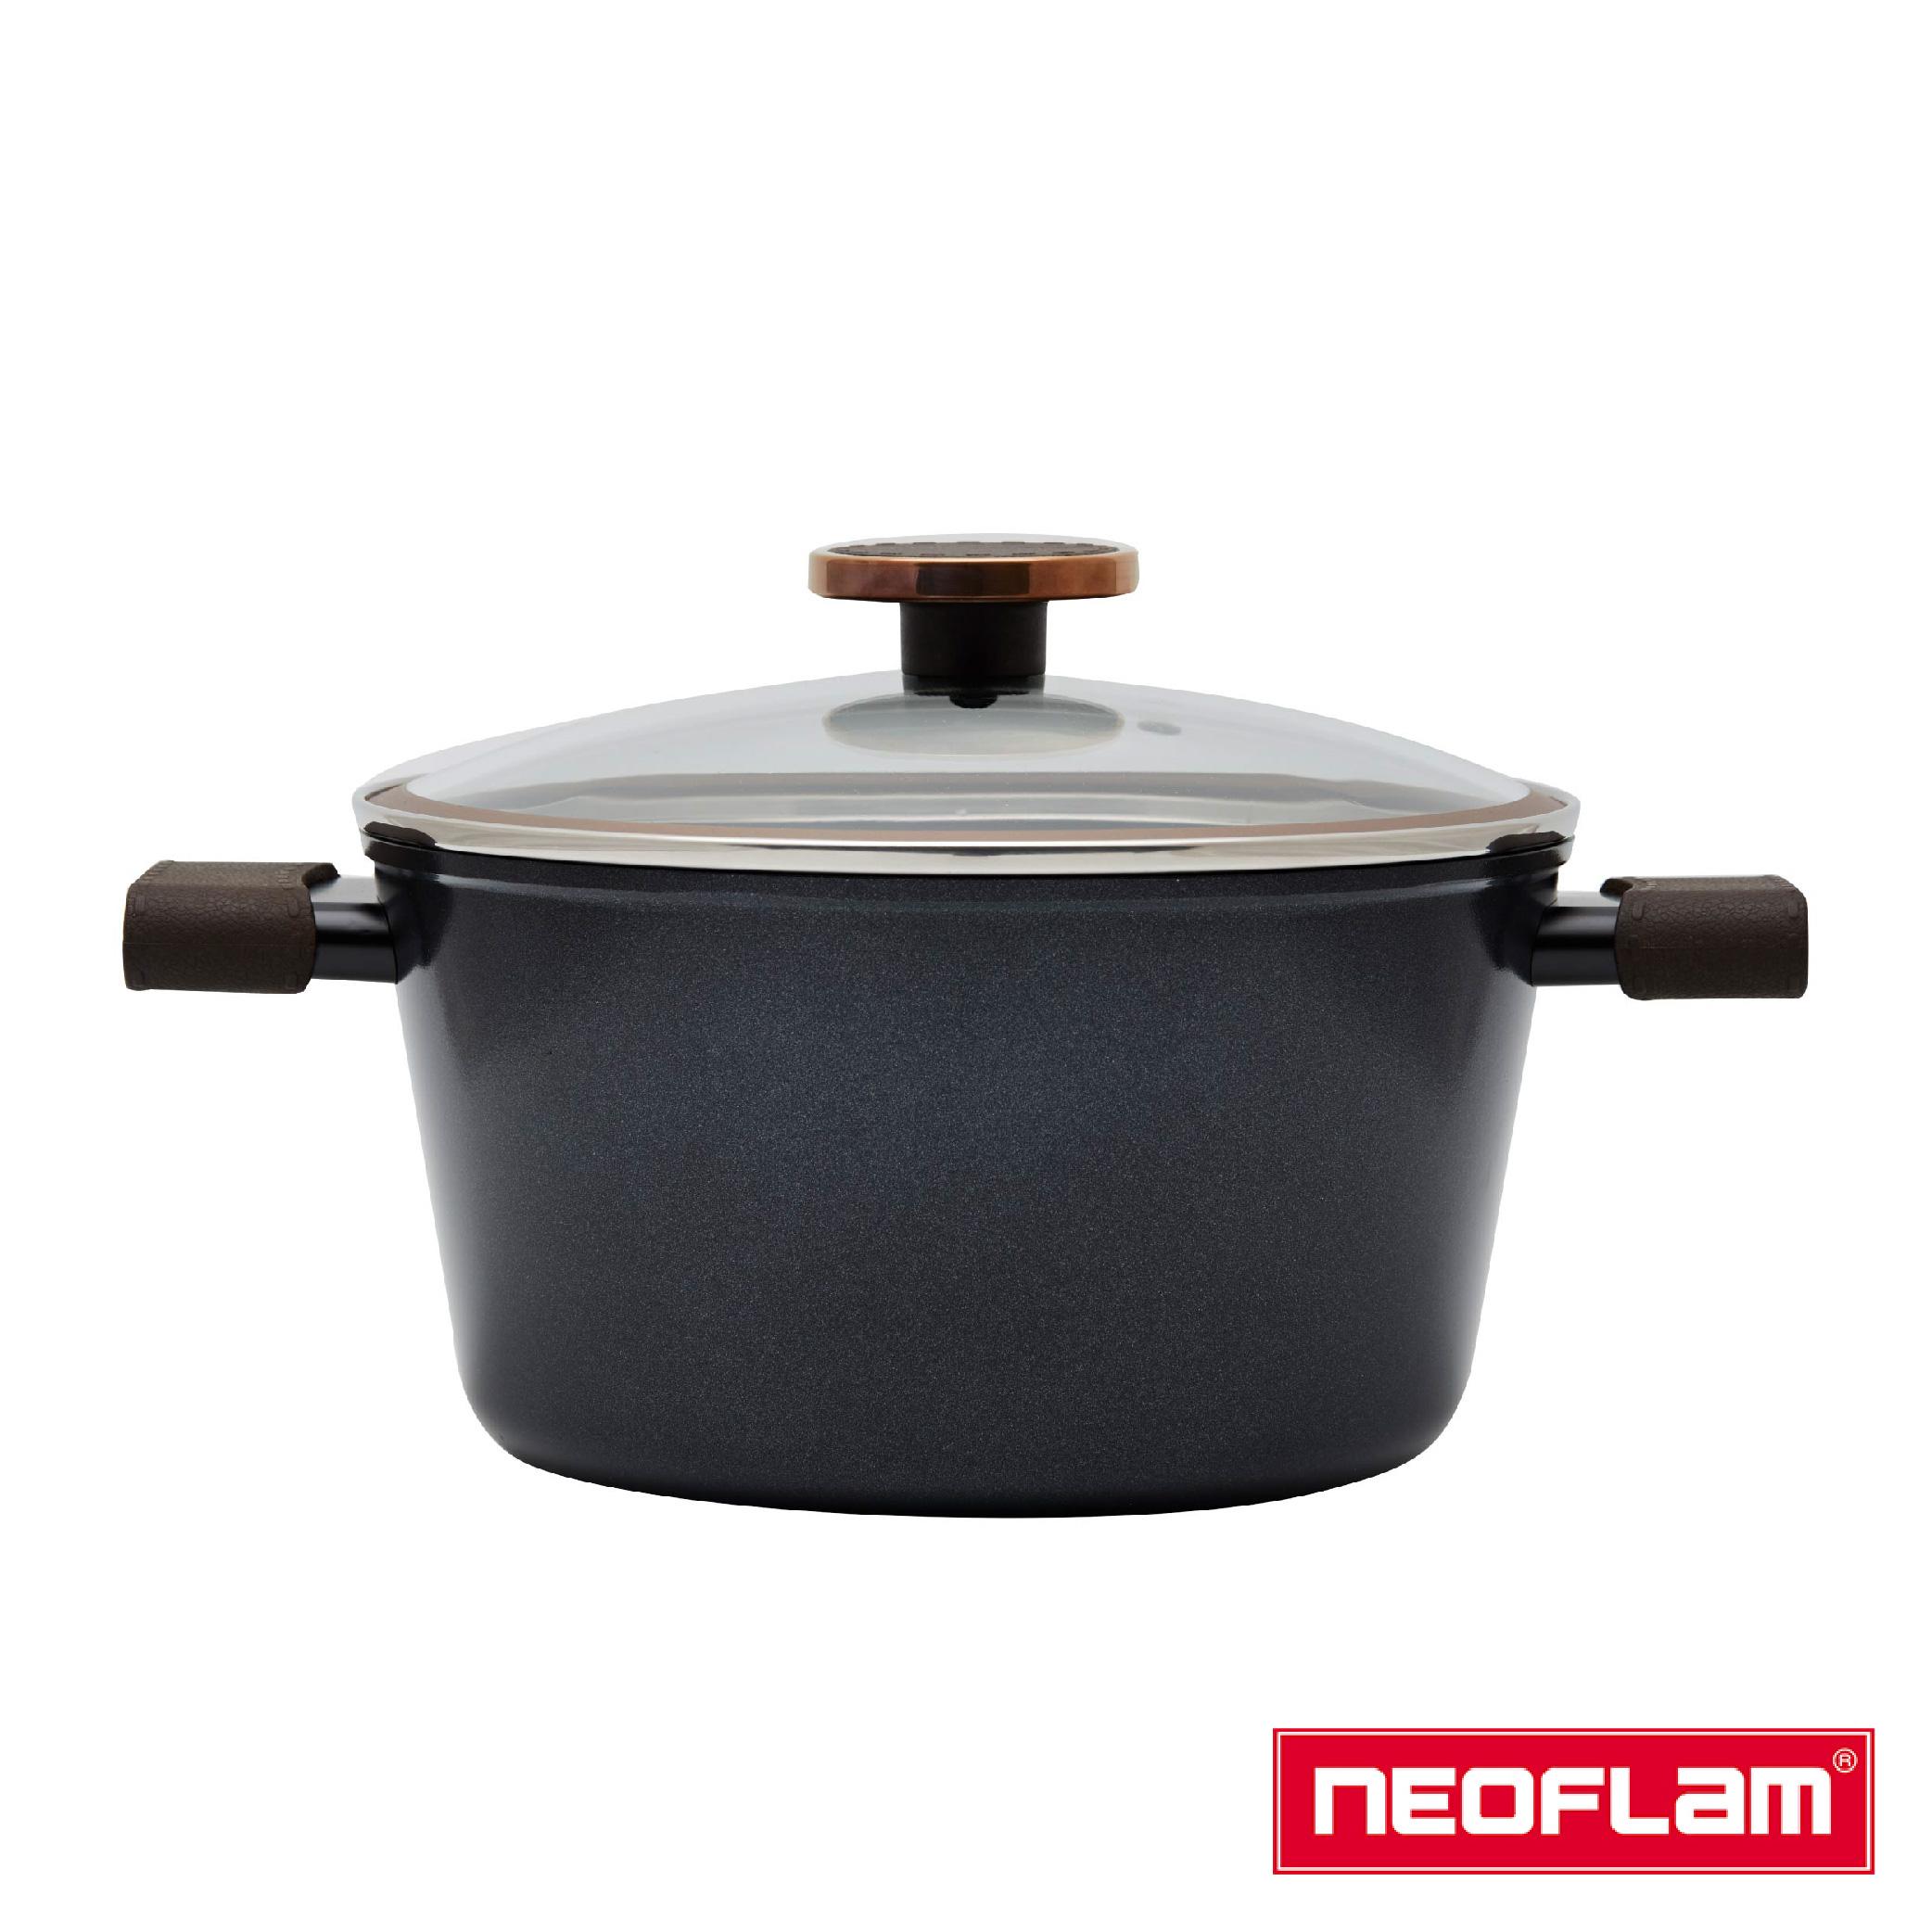 【NEOFLAM】Noblesse大貴族系列雙耳湯鍋20cm電磁底